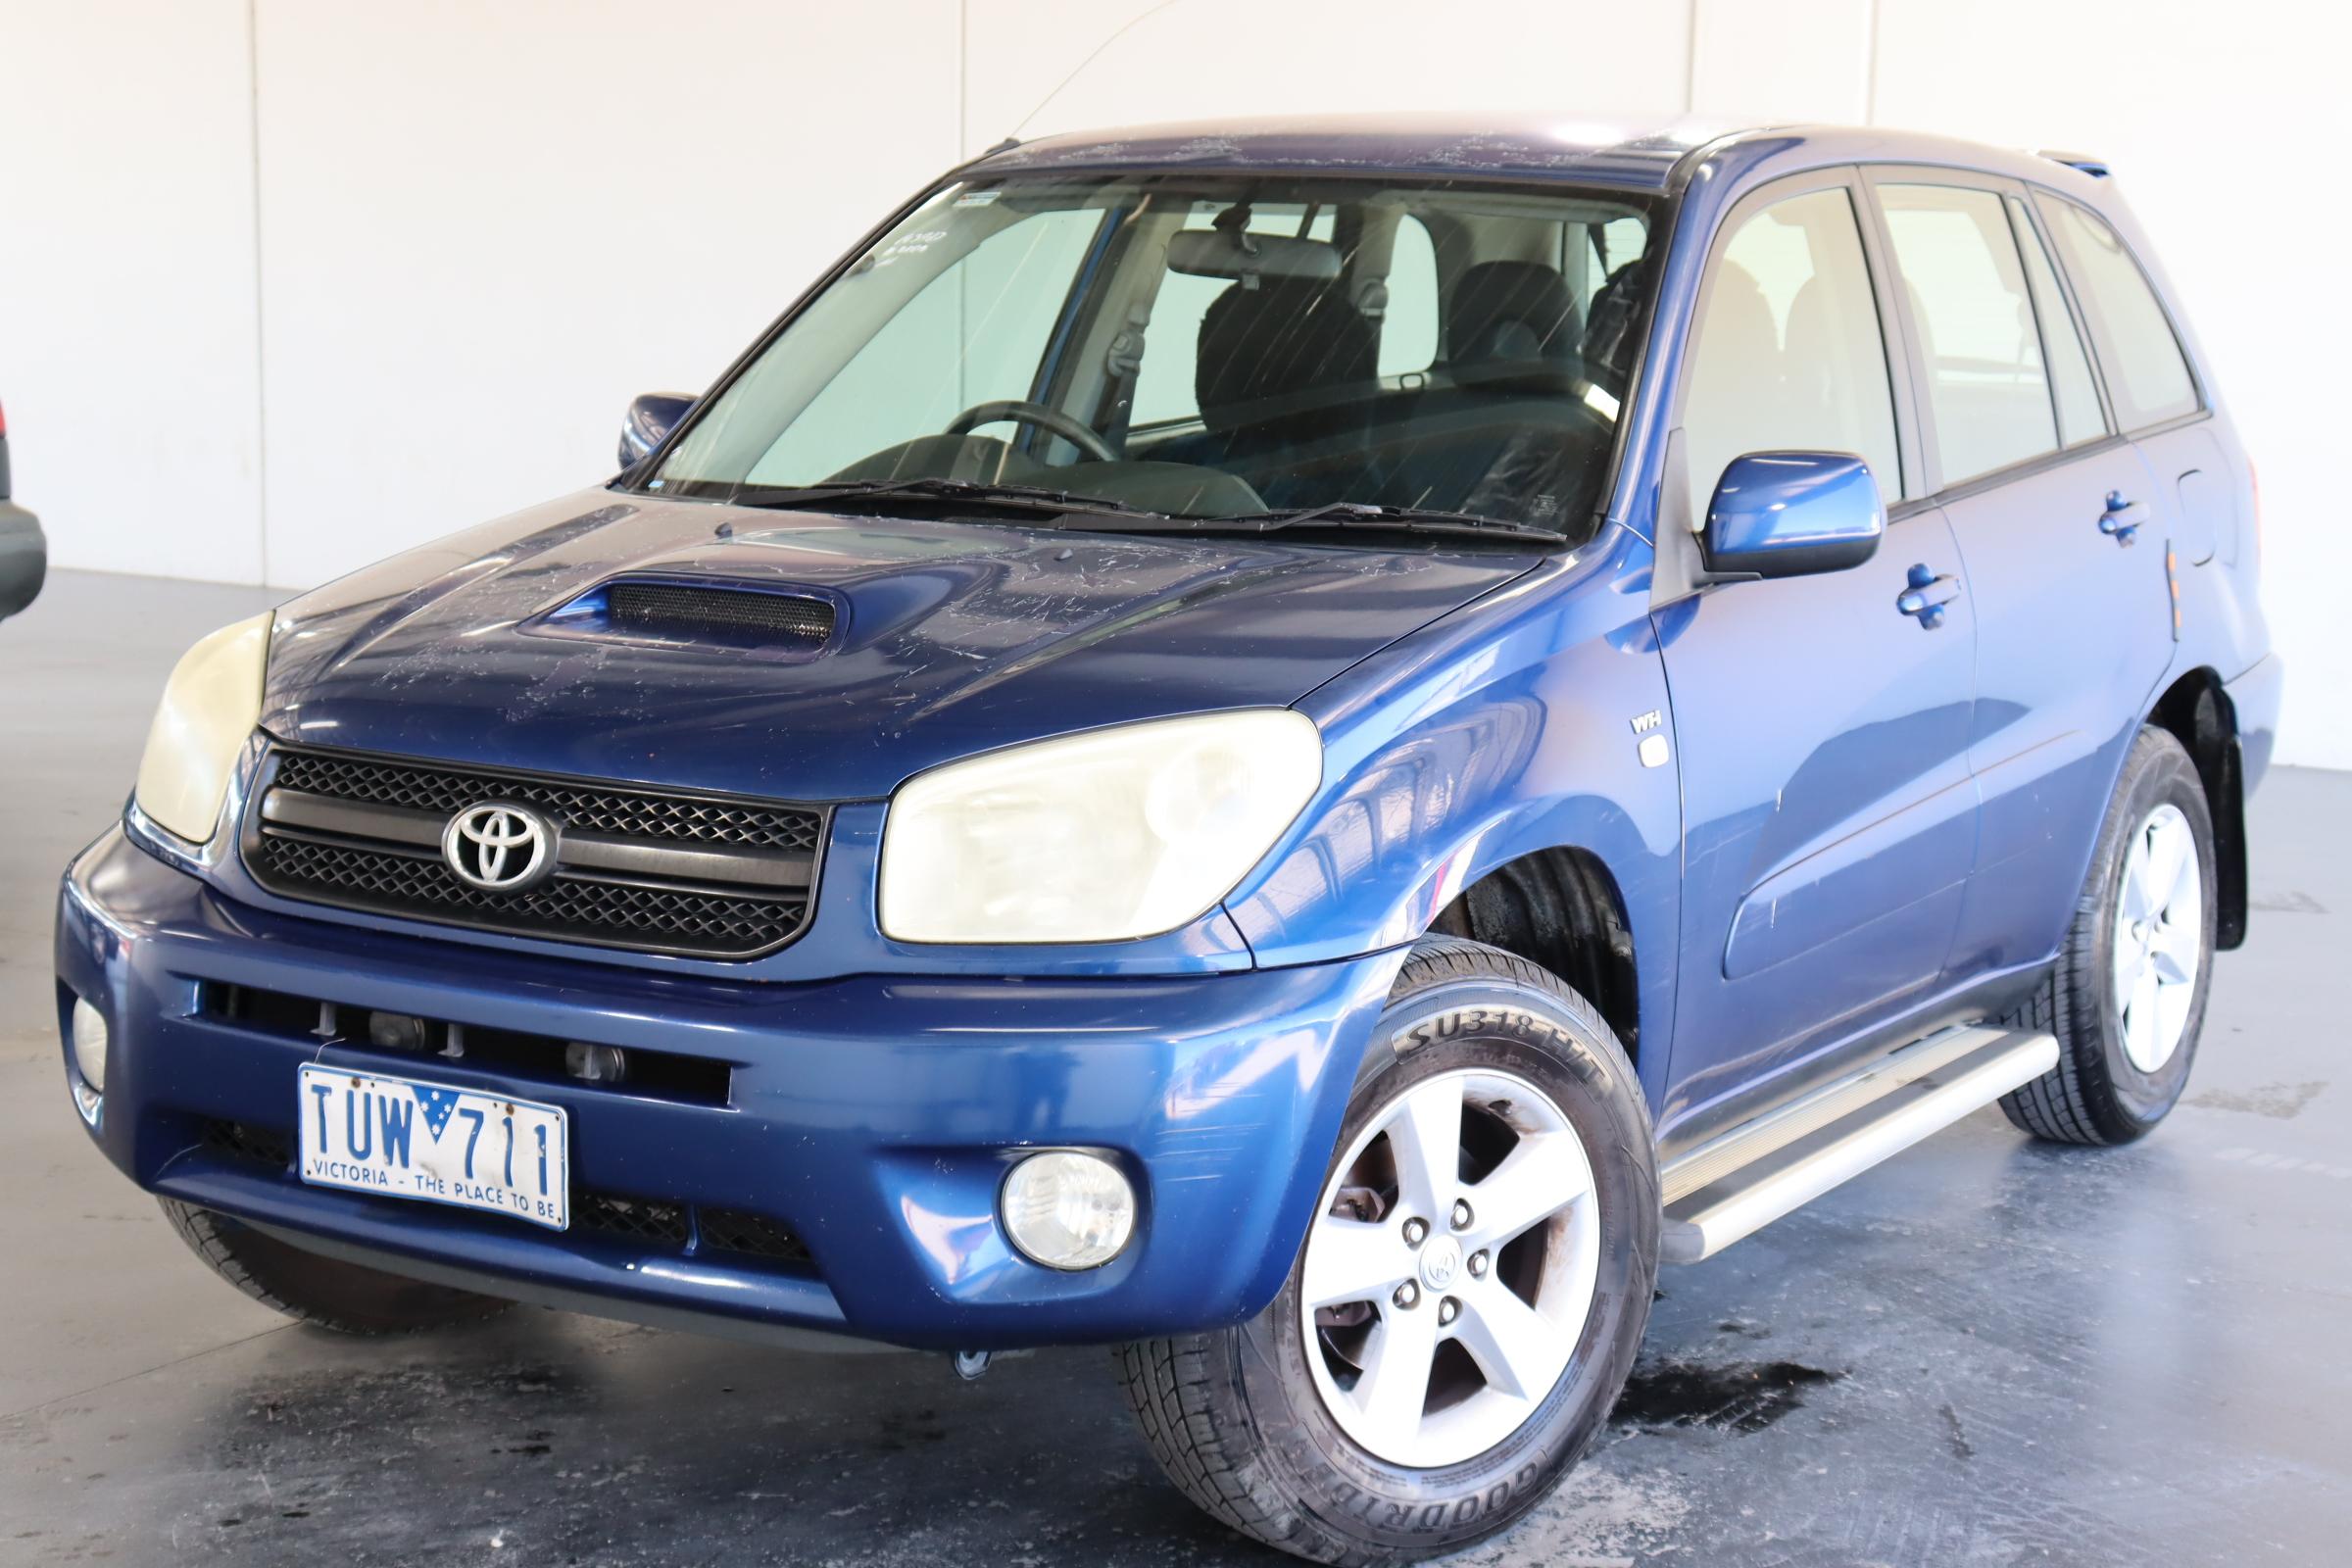 2005 Toyota Rav 4 CV (4x4) ACA23R Automatic Wagon